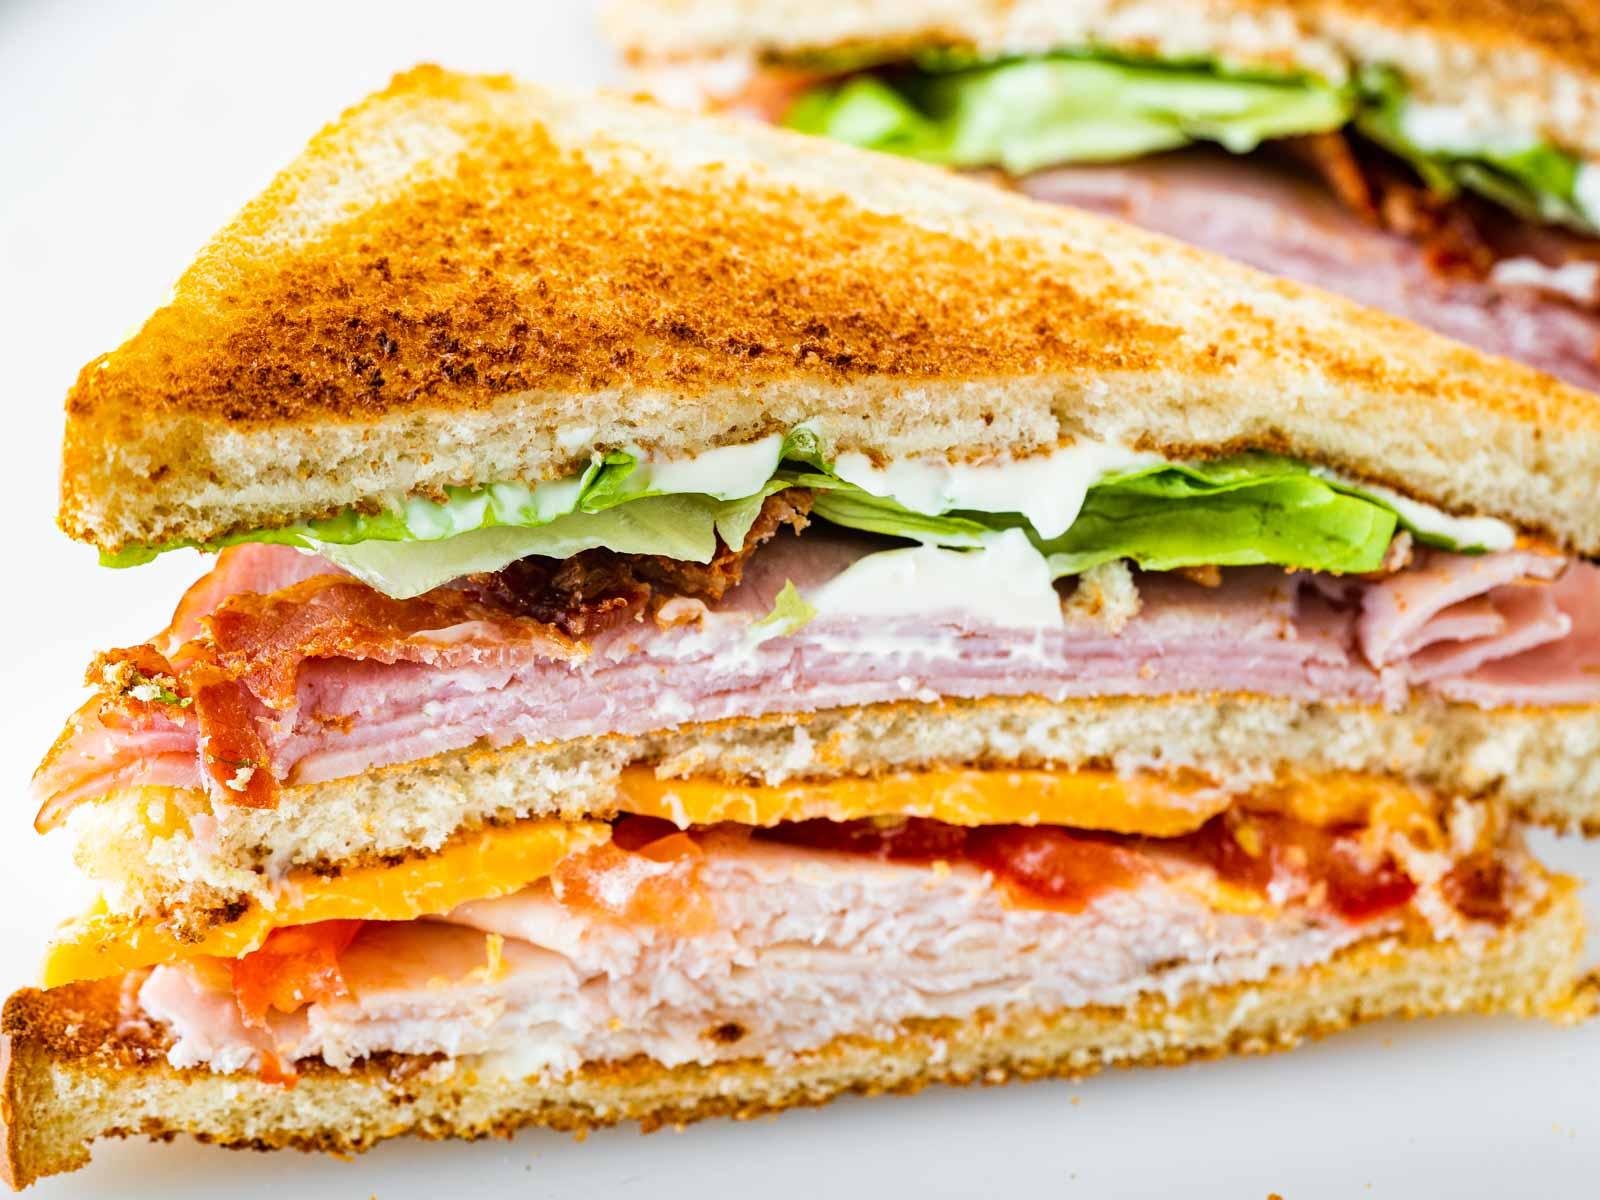 closeup of half a club sandwich.